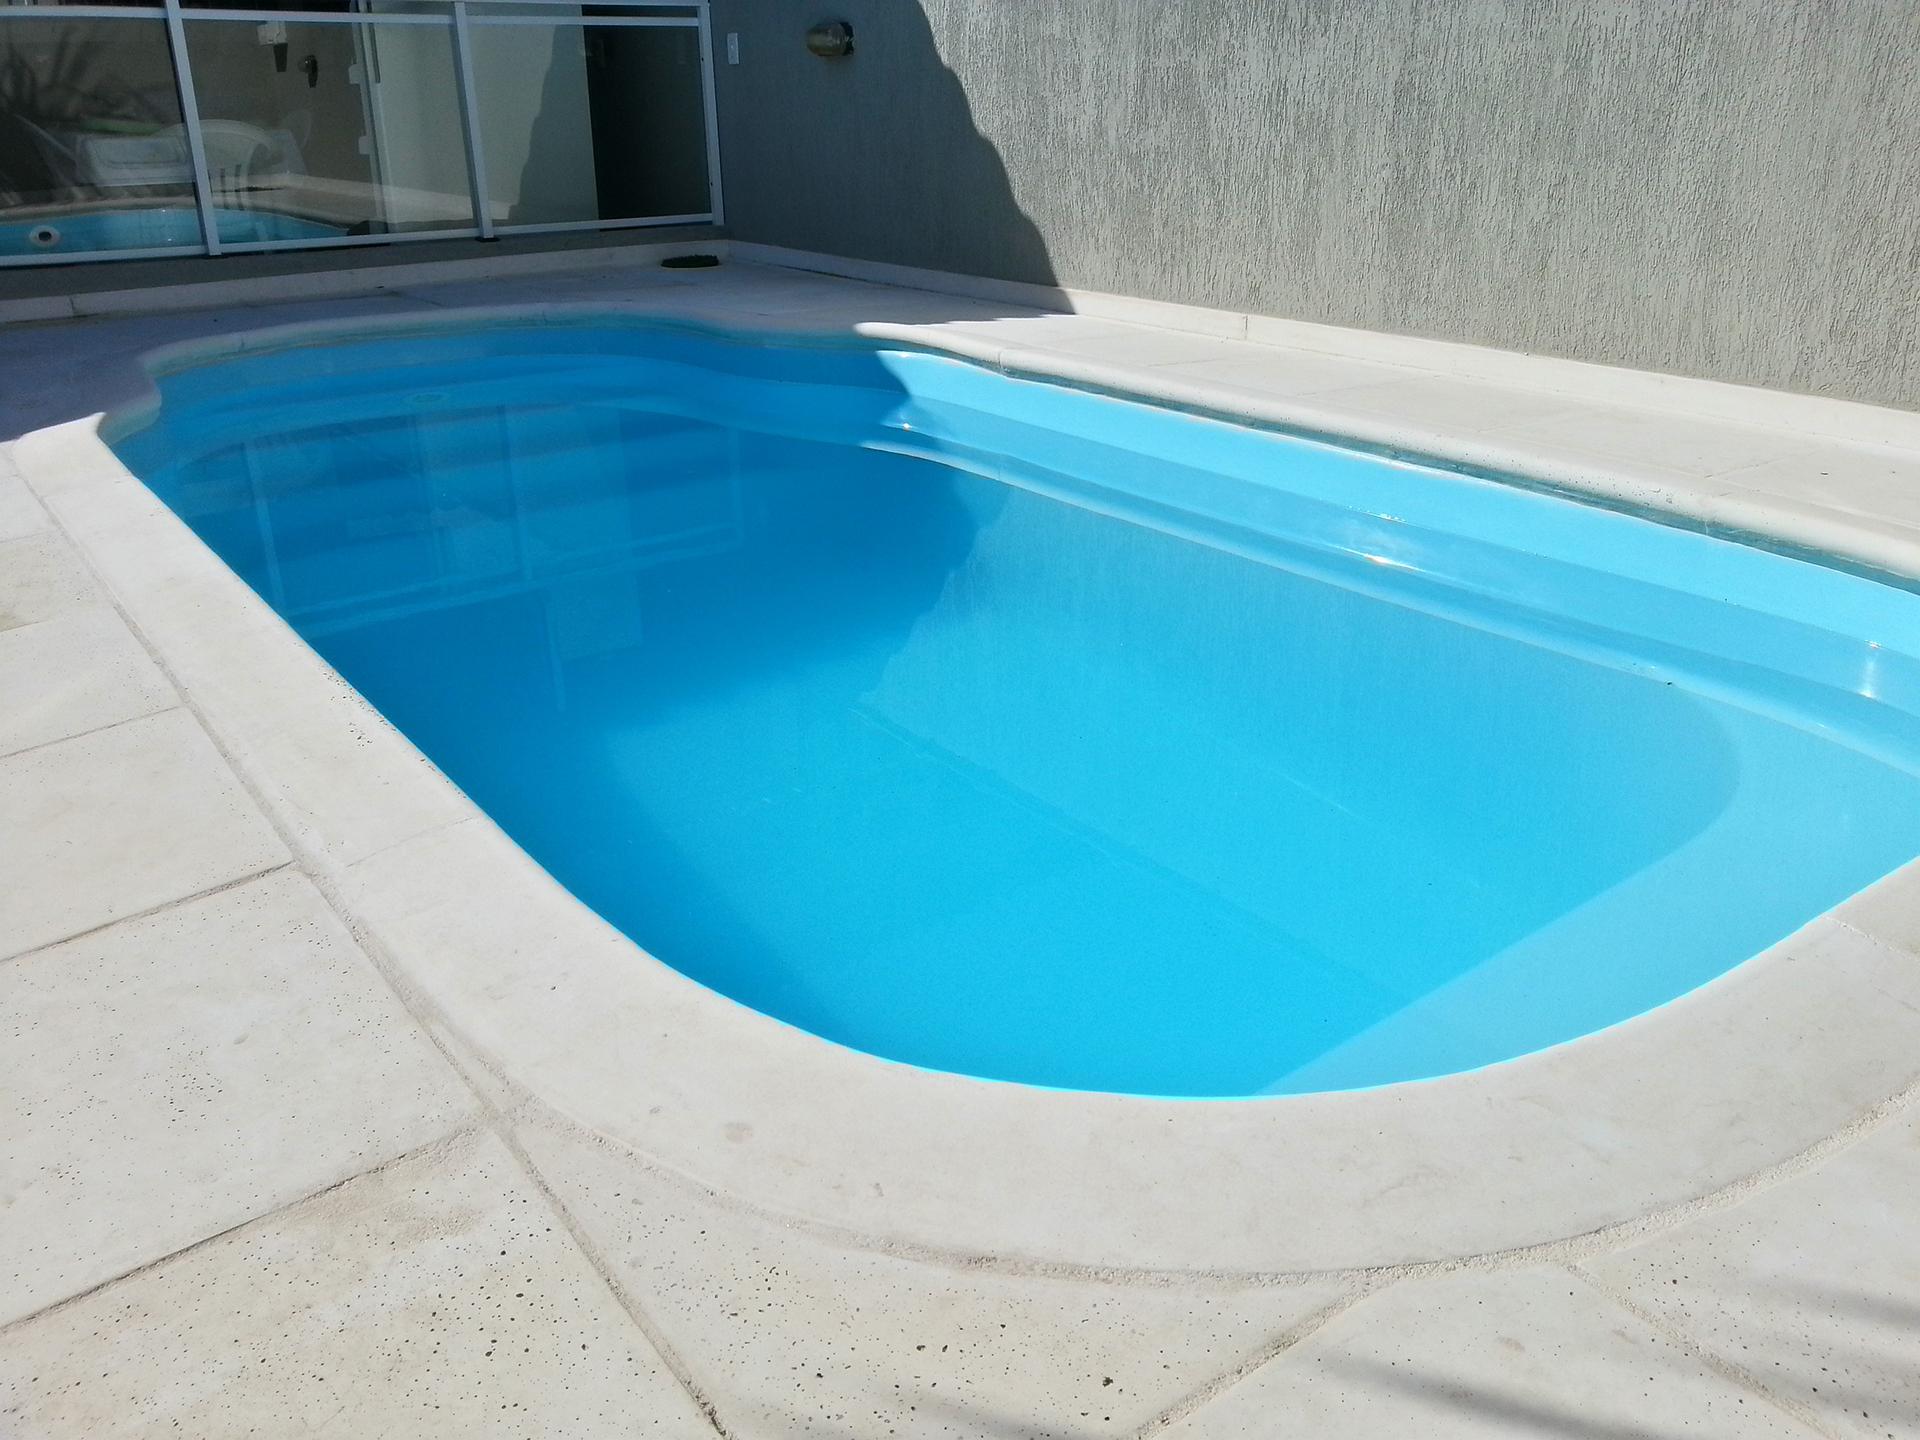 Bordas de piscina at rmicas e personalizadas dharma for Ver tipos de piscinas